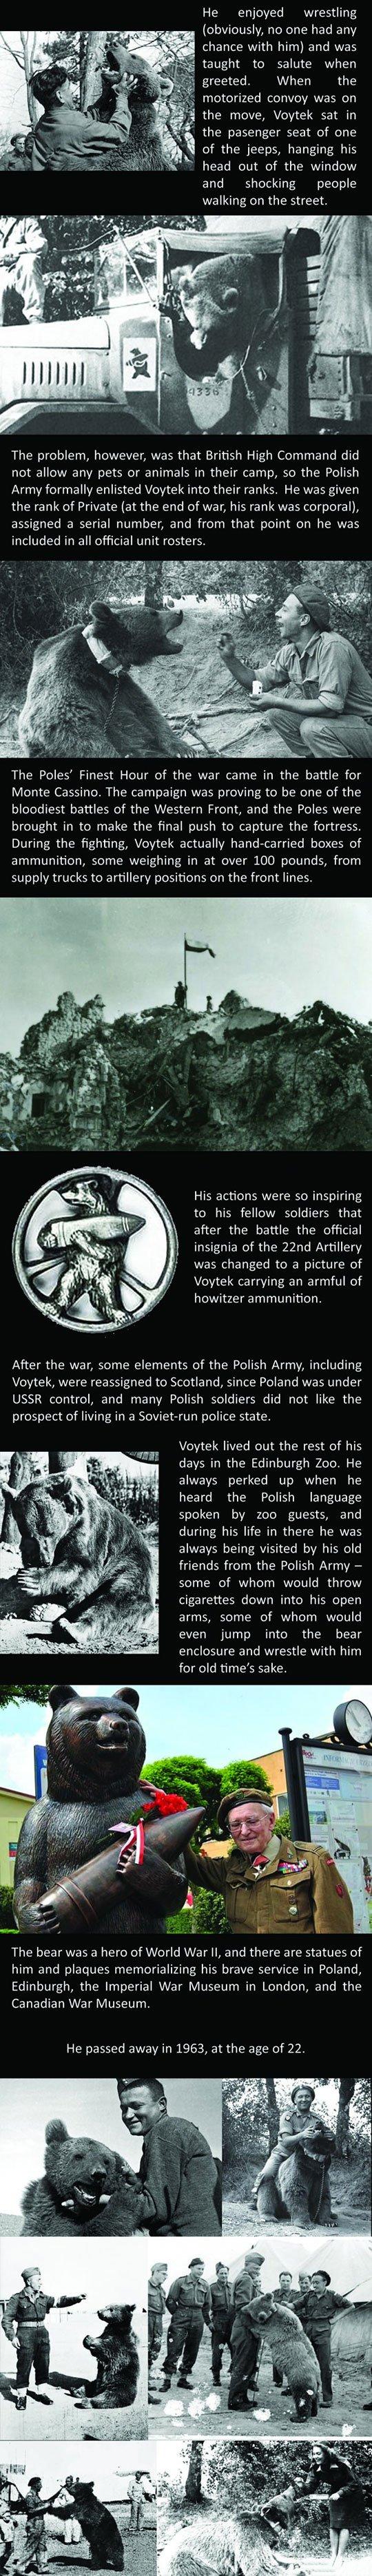 woytek_the_soldier_bear_2